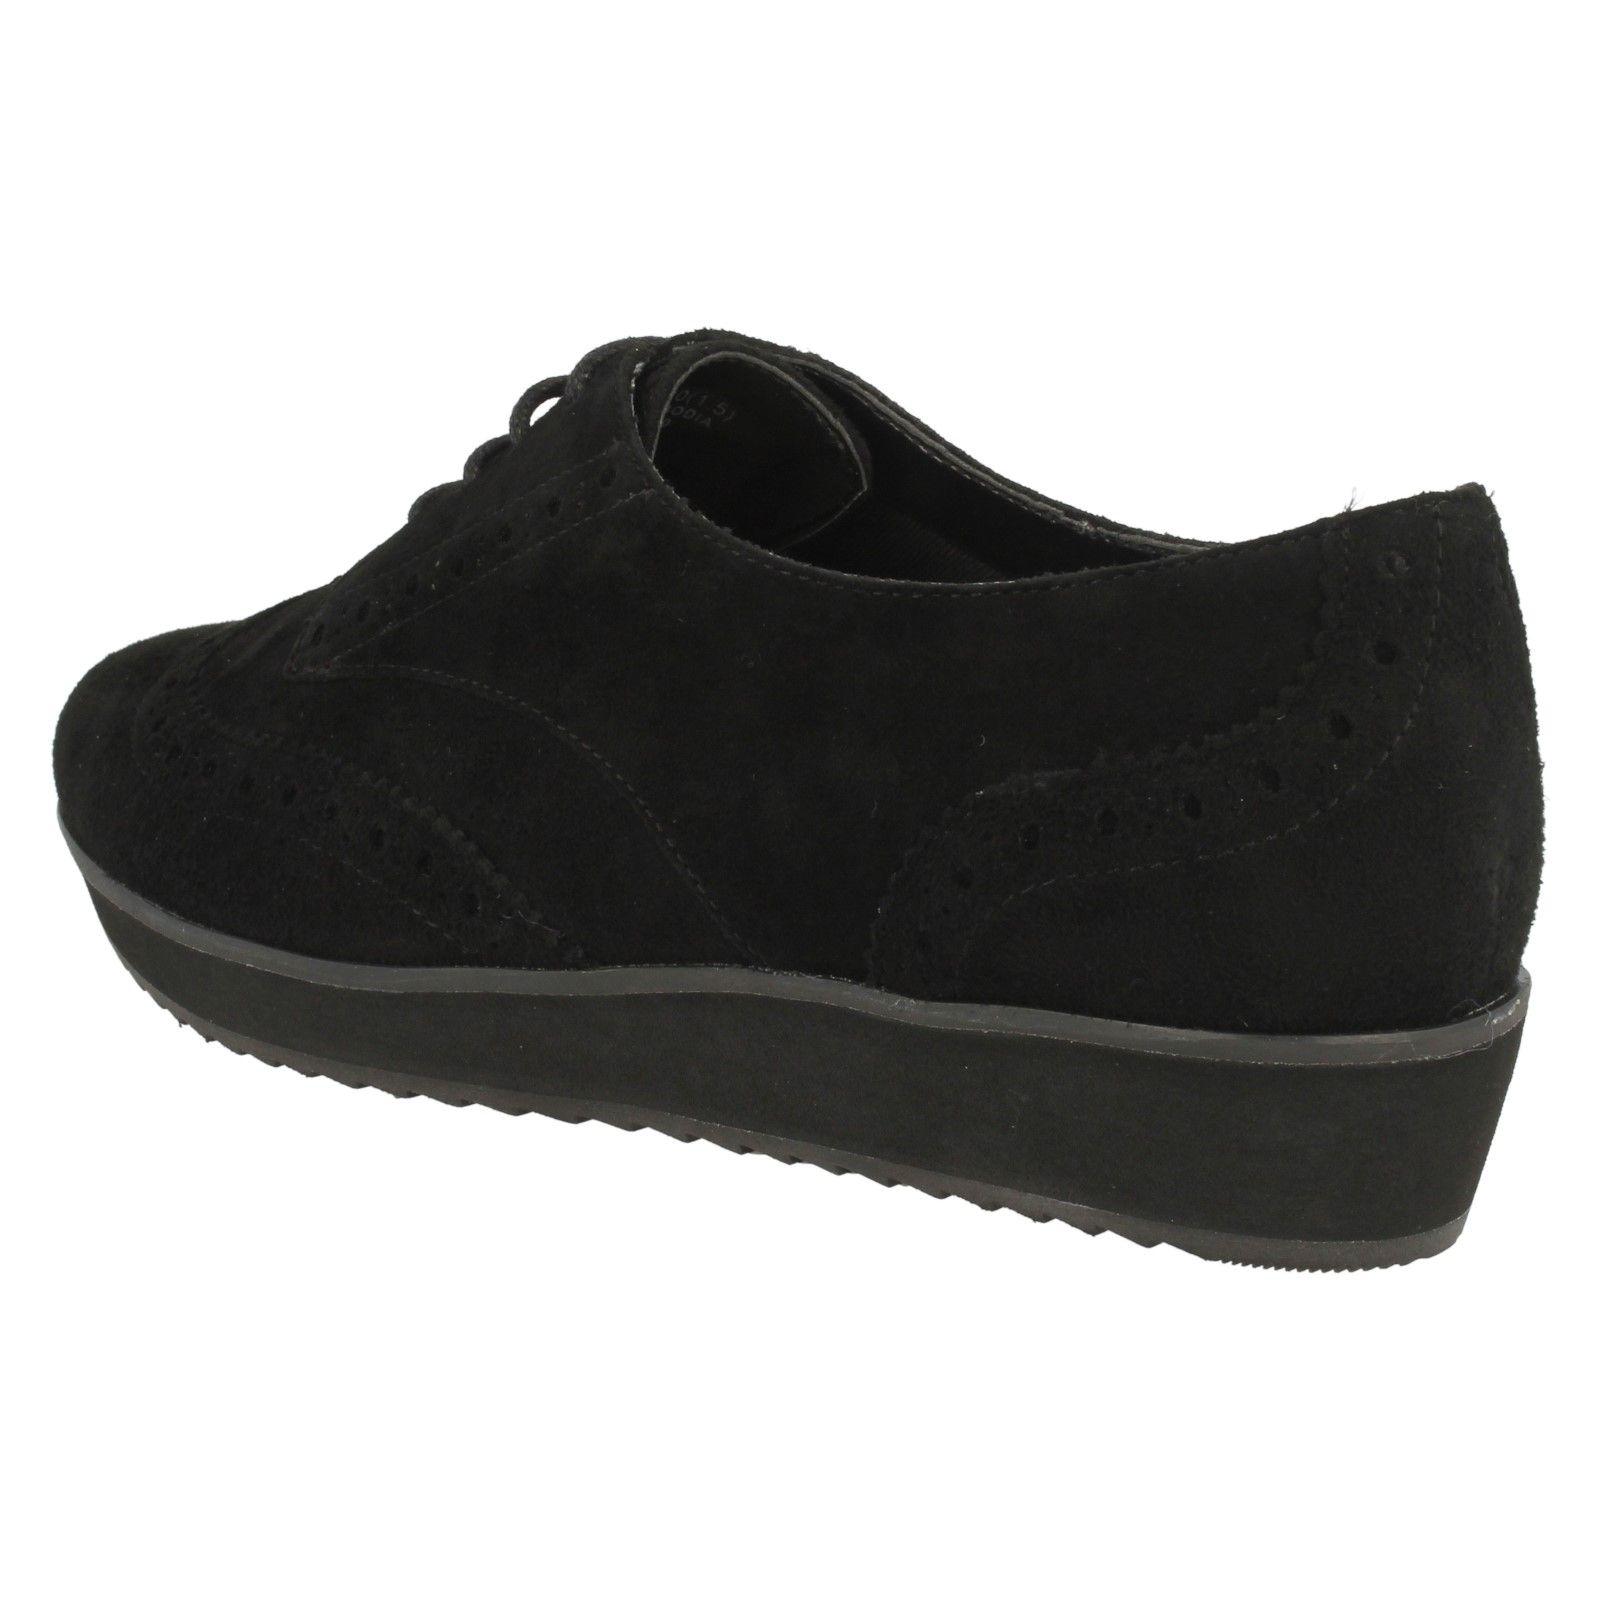 Hotter Shoes Sale Ebay